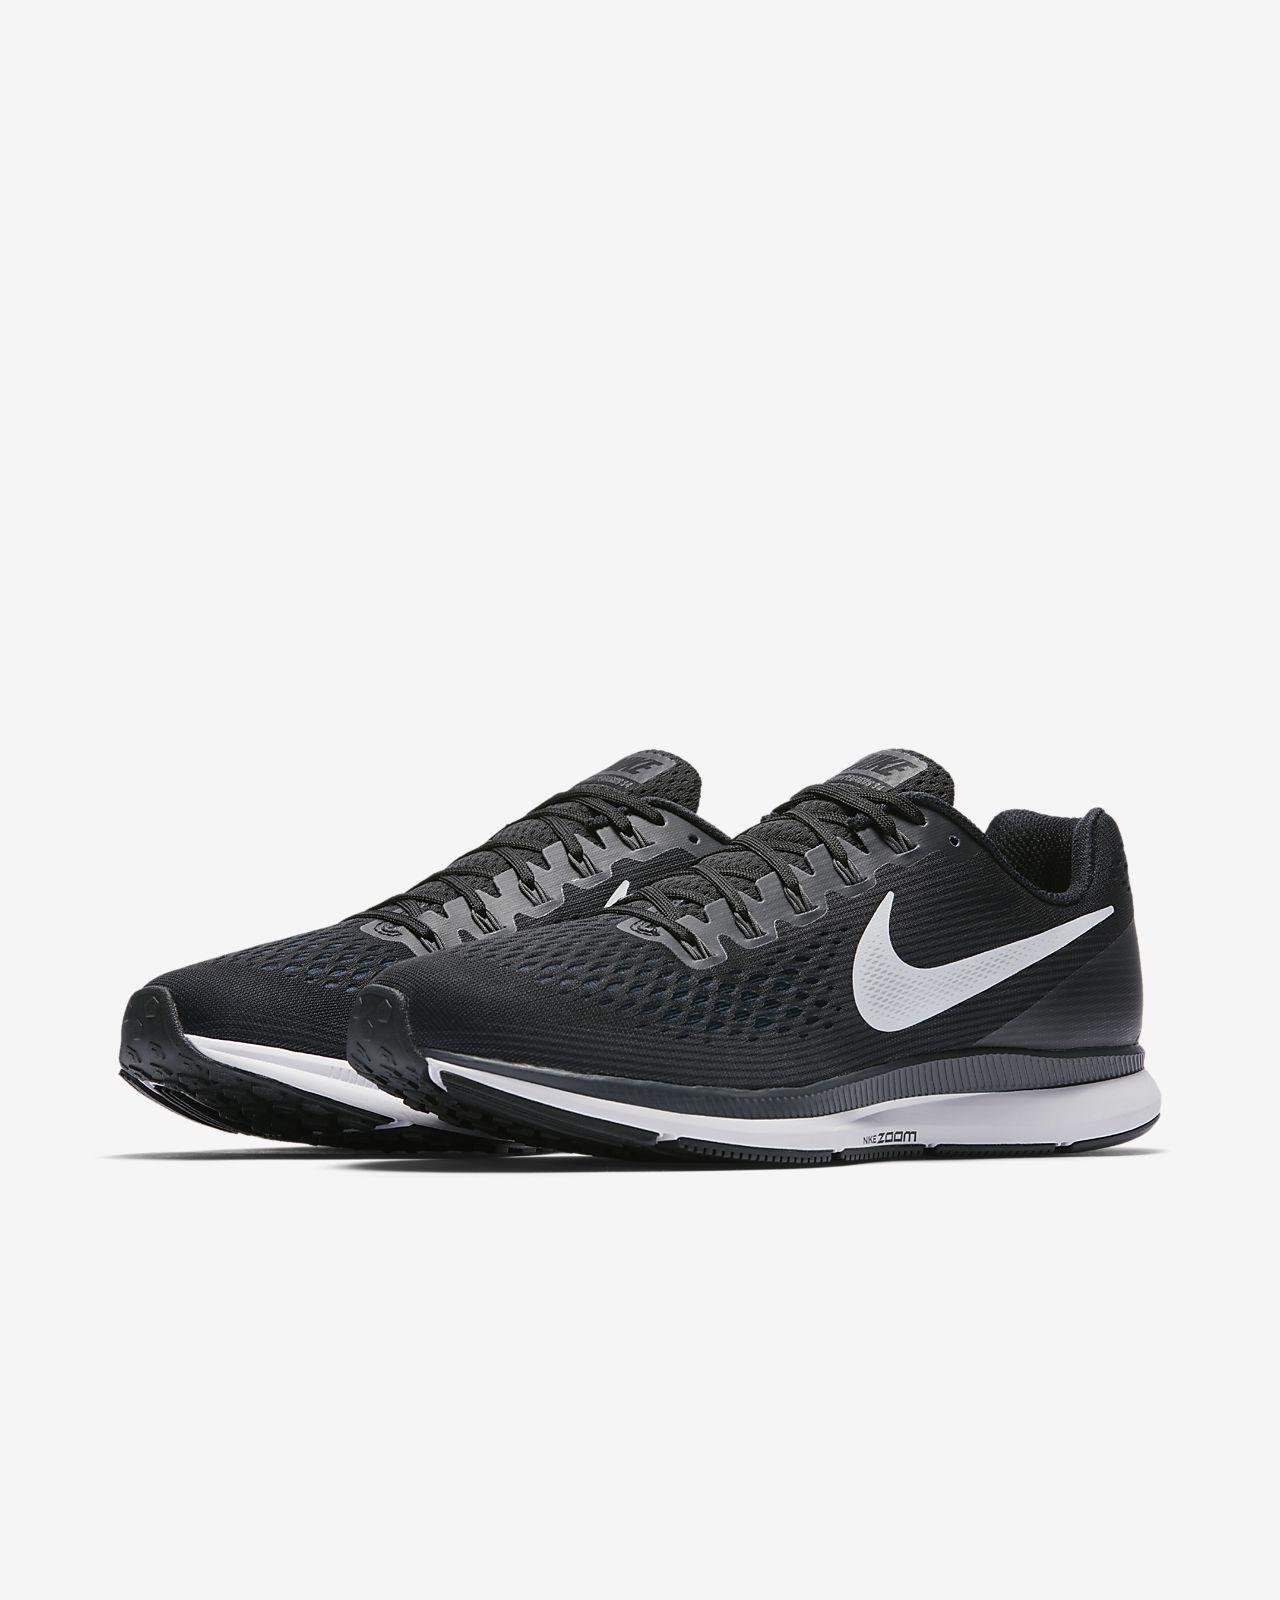 Nike Air Zoom Pegasus 34 Mens Navy Blue White Grey